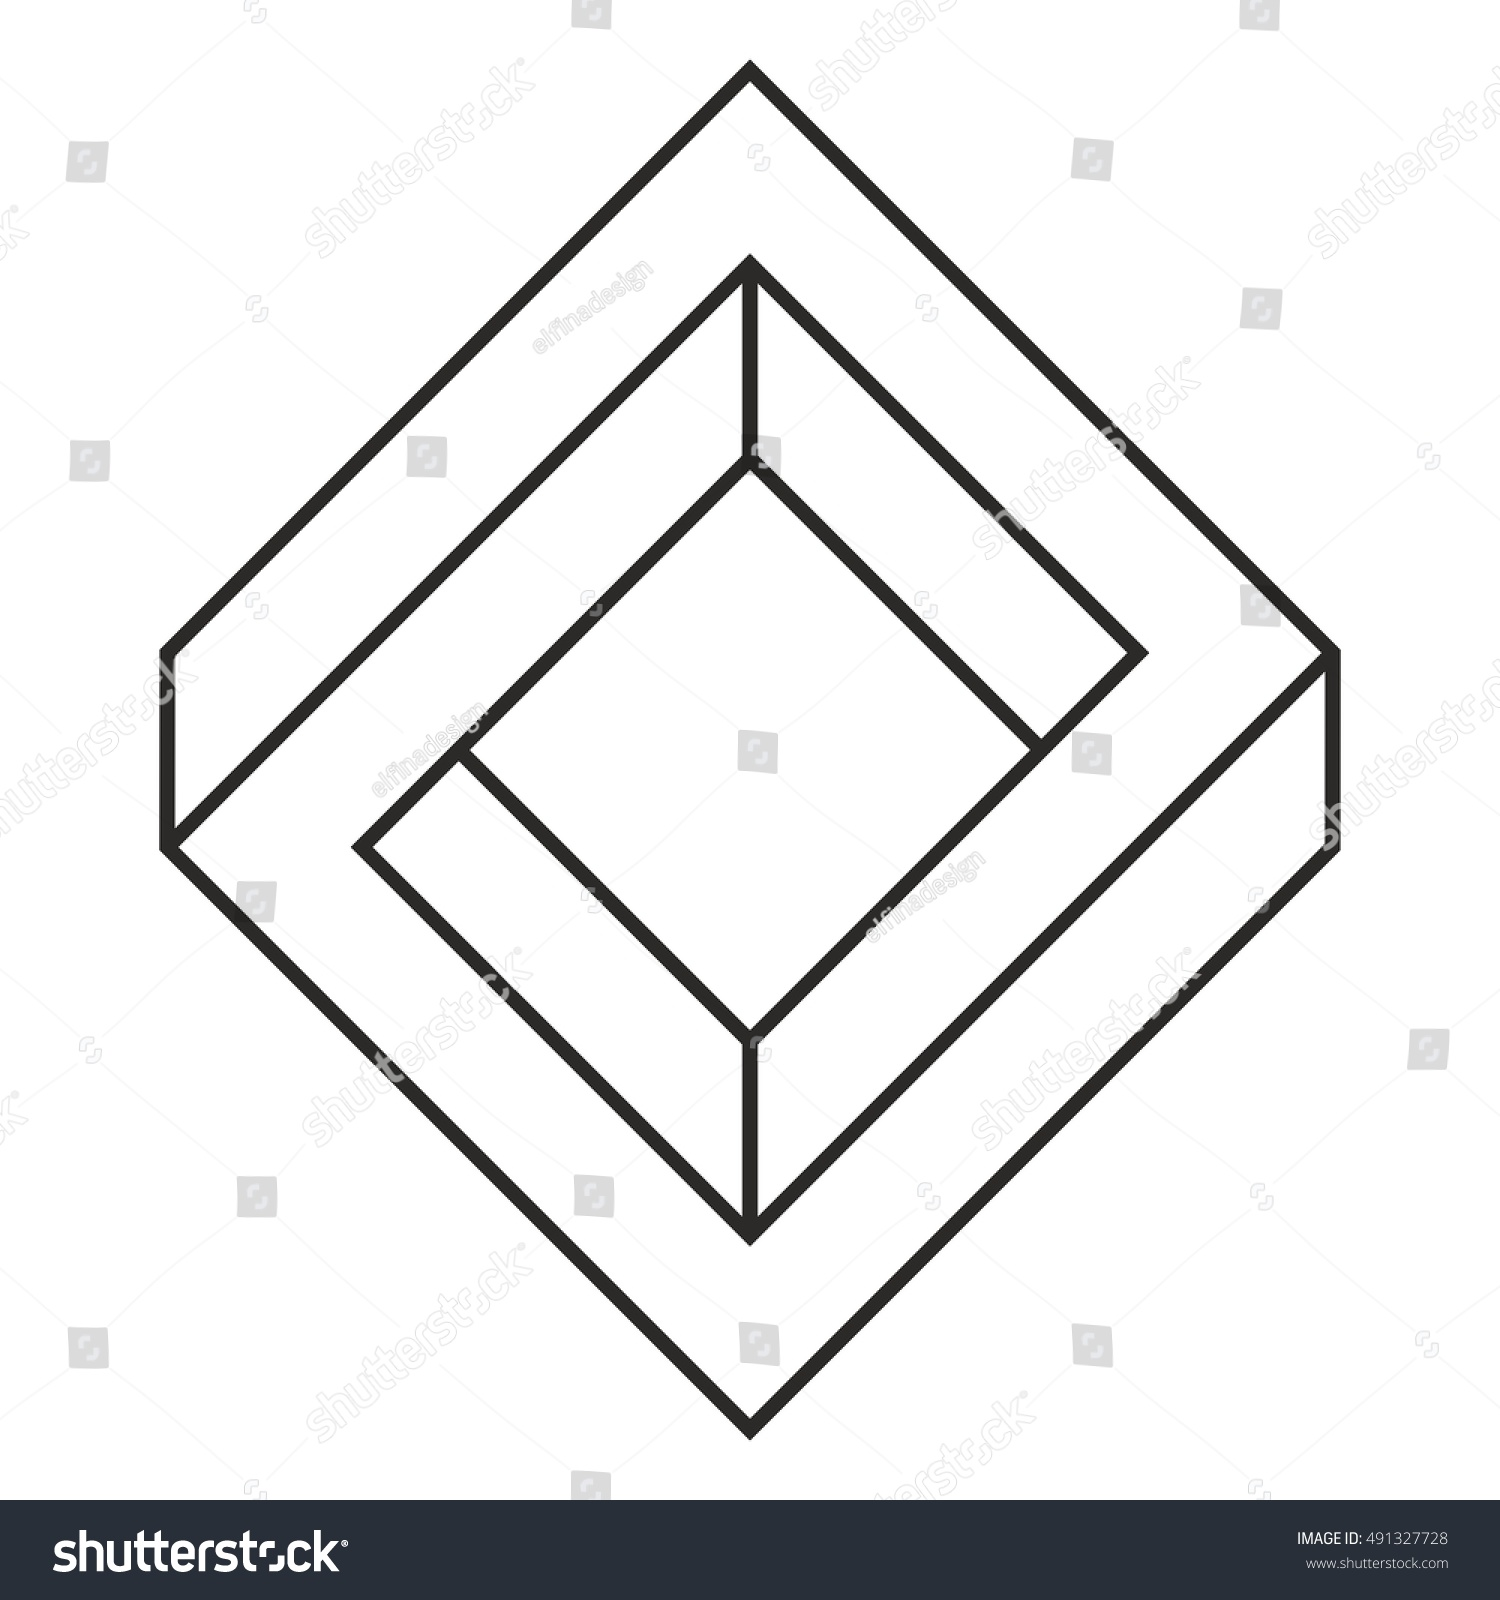 Penrose square impossible square optical illusion stock vector penrose square impossible square optical illusion pooptronica